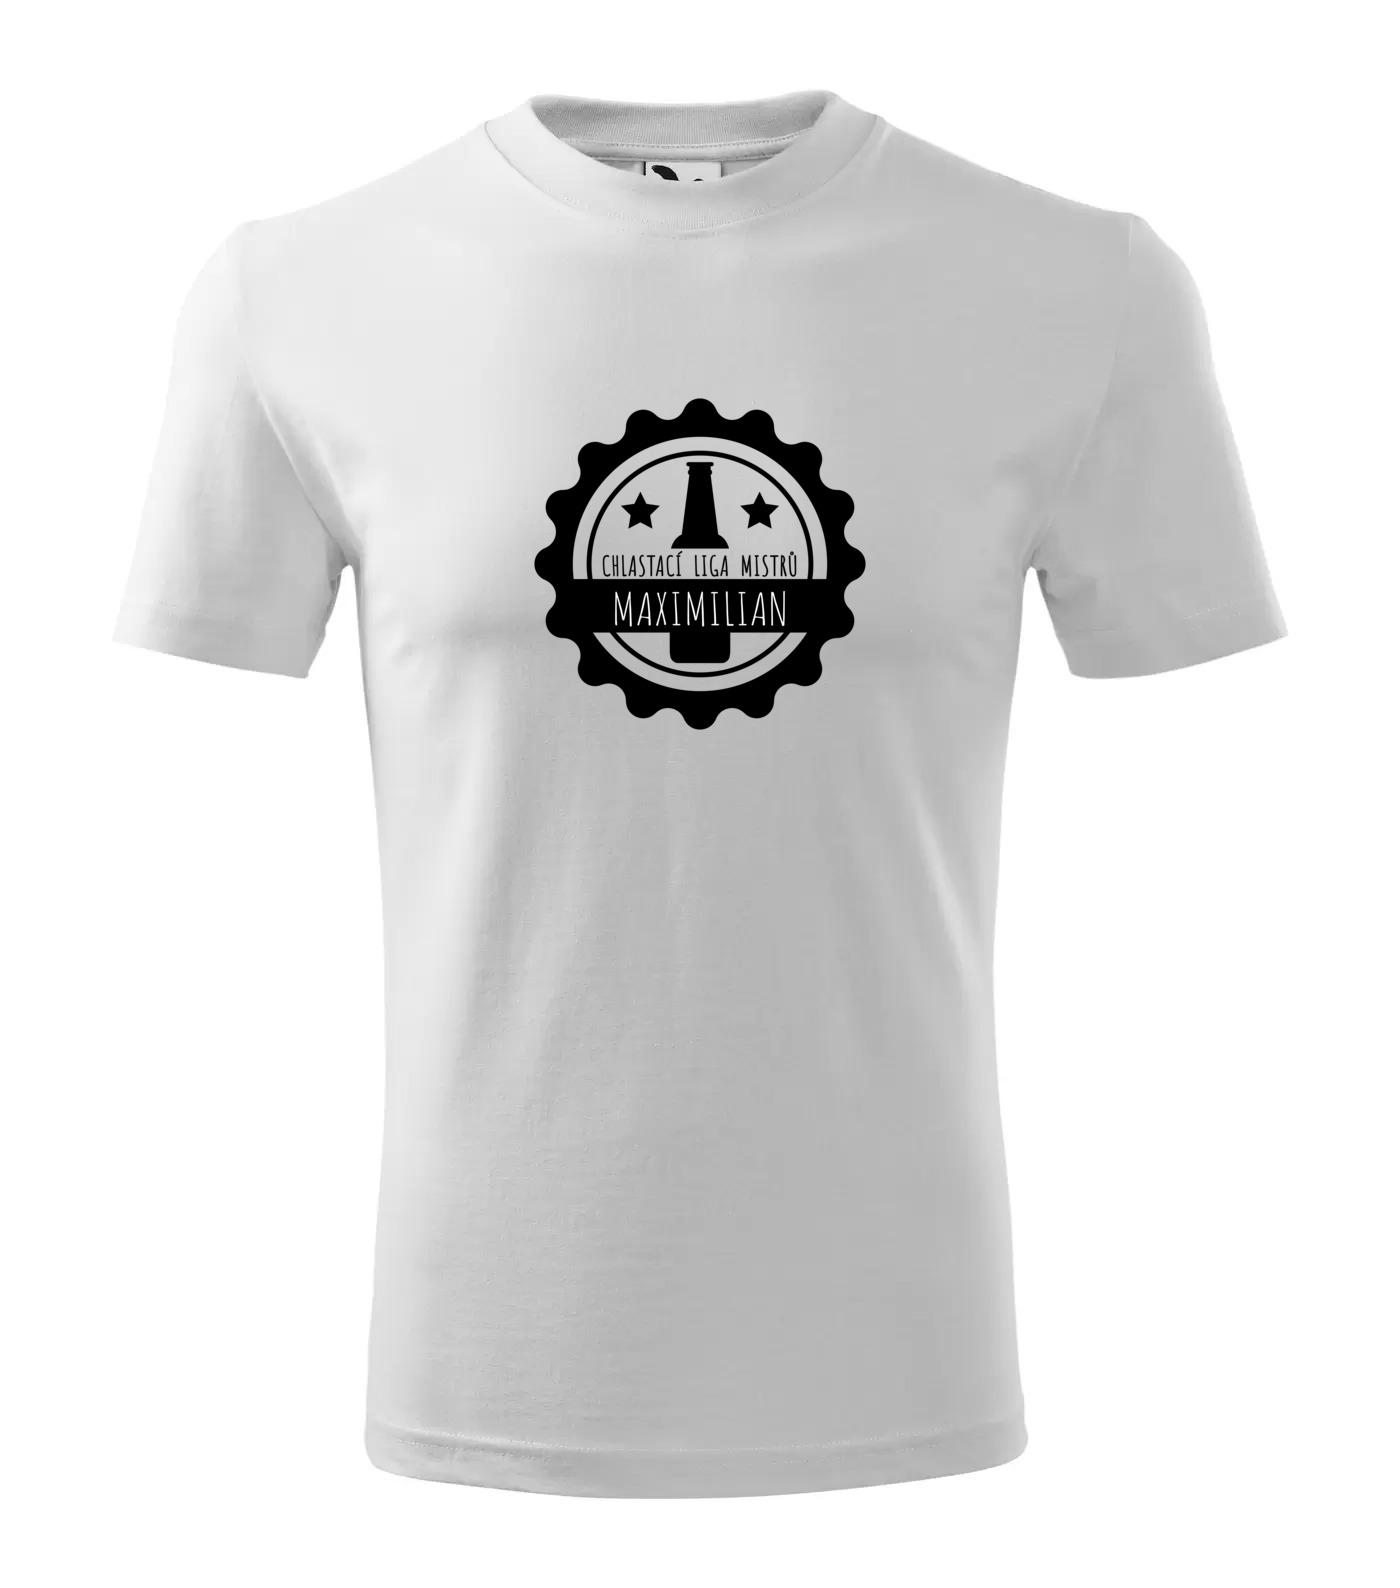 Tričko Chlastací liga mužů Maximilian